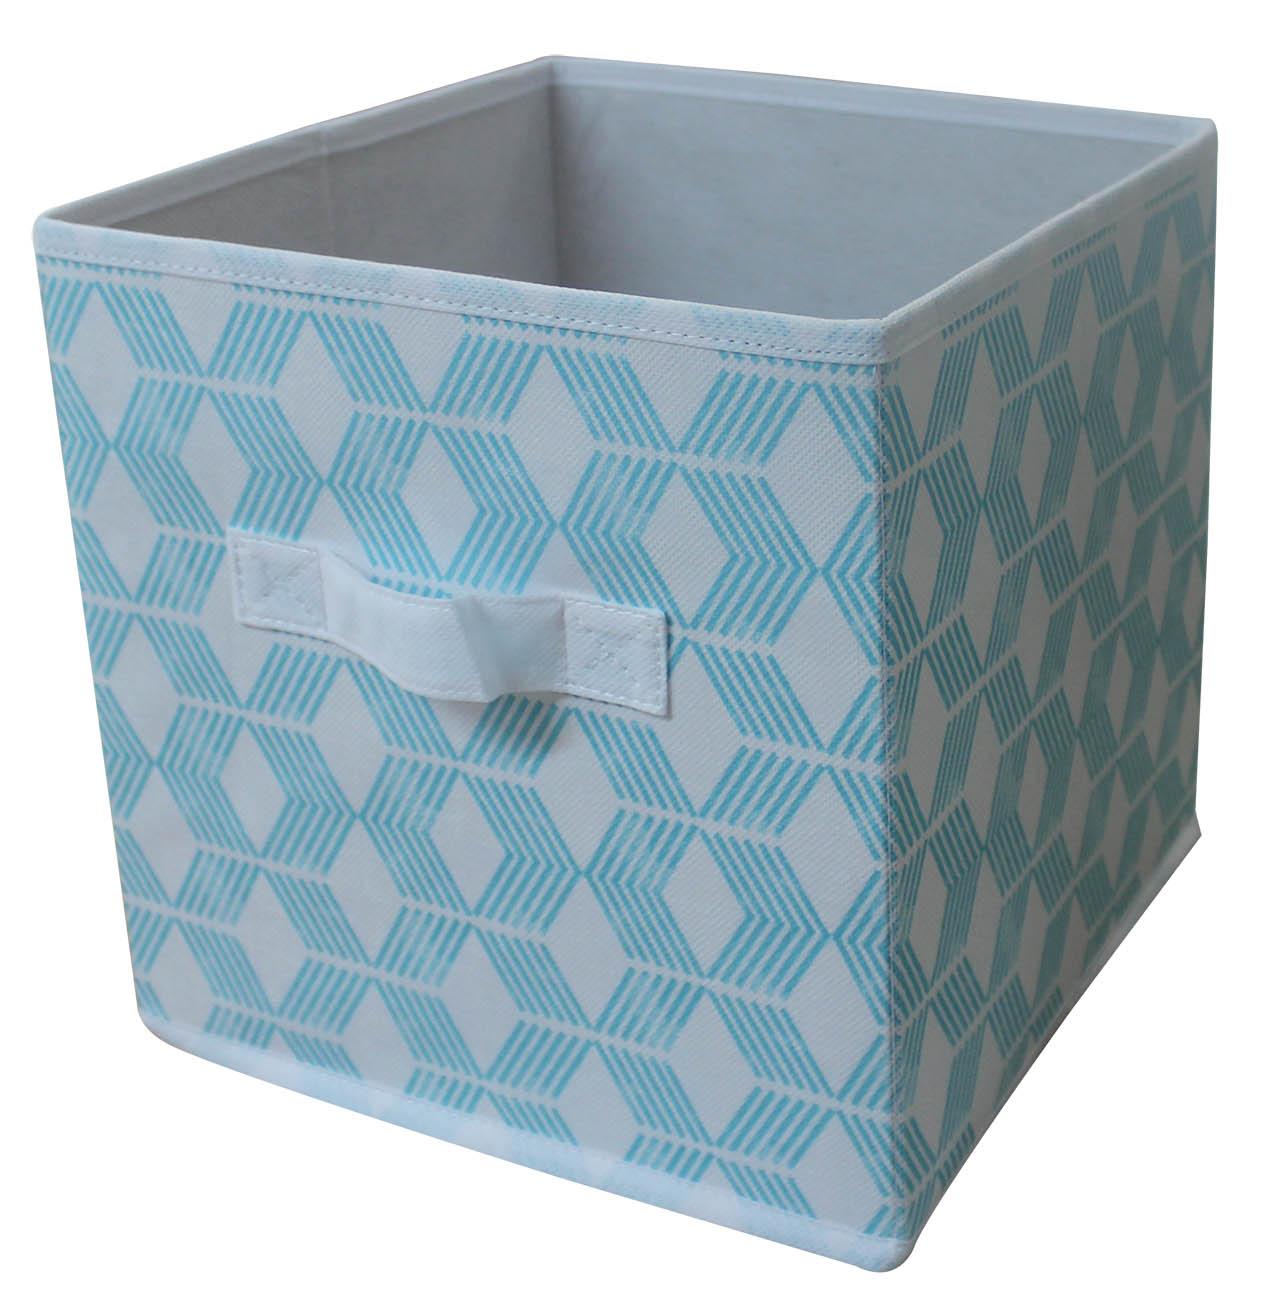 "Mainstays 10.5"" x 10.5"" Collapsible Cube Aqua Diamond Storage Bins"